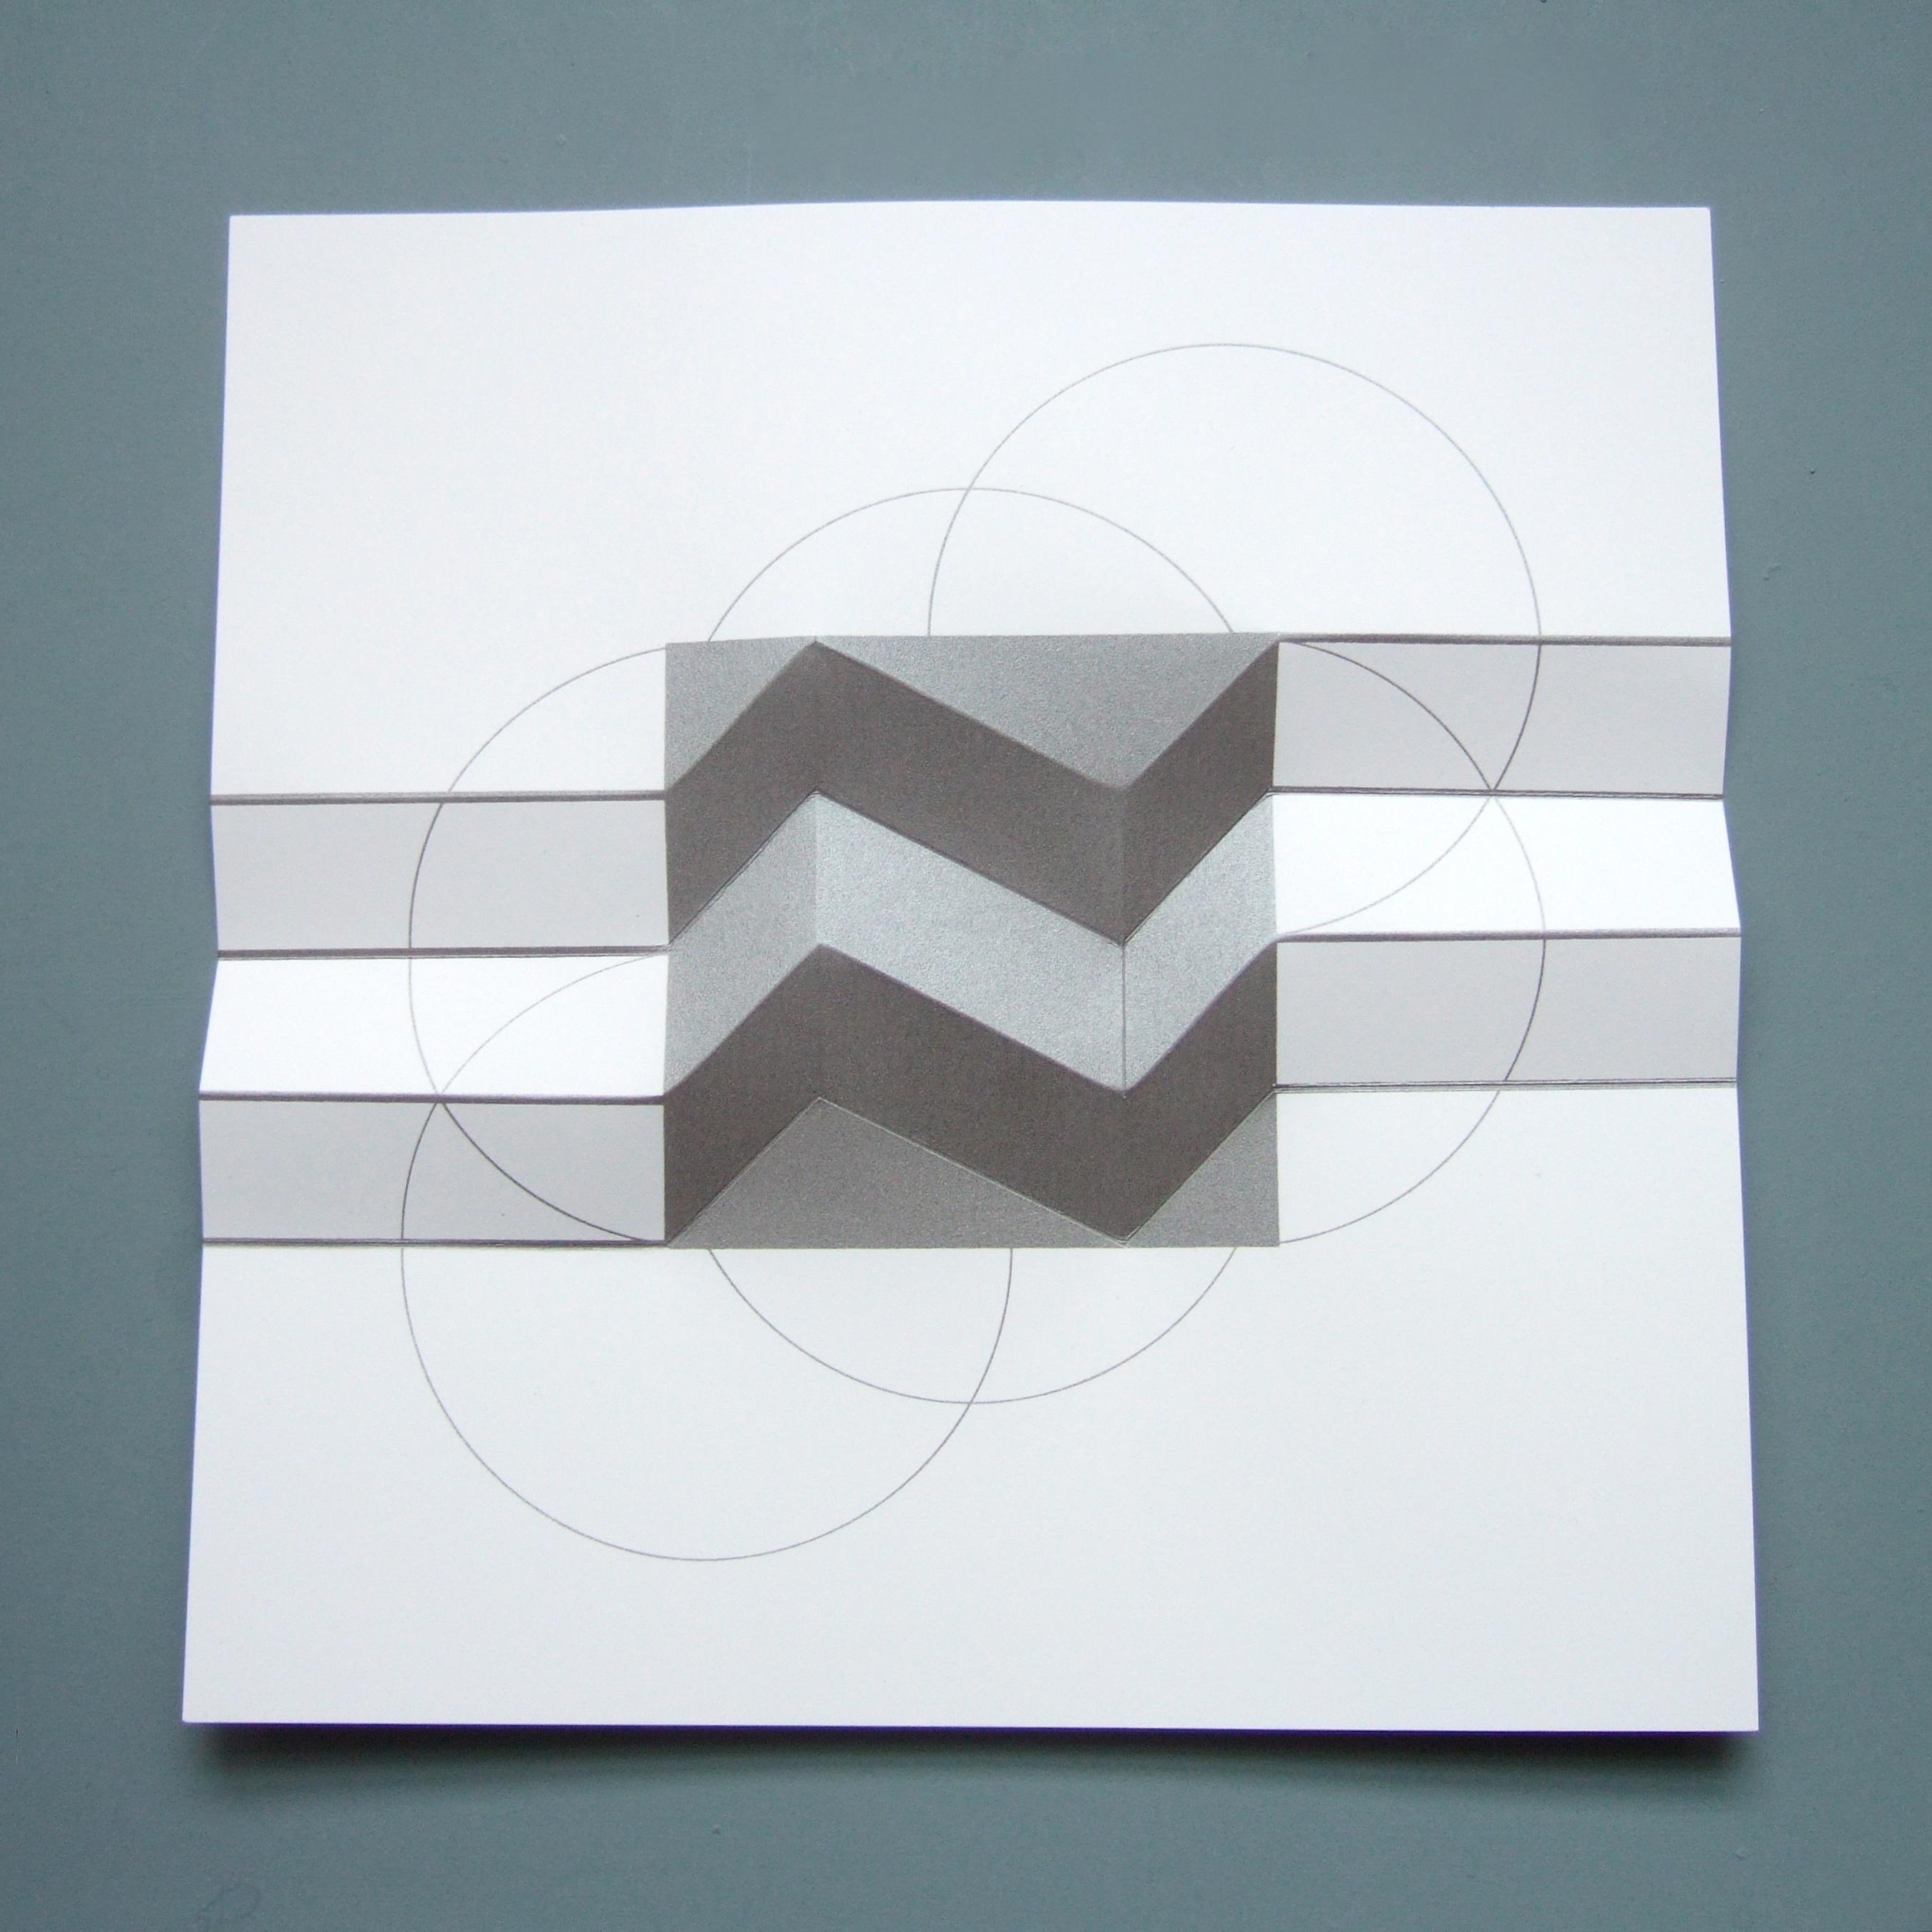 Brigitte Parusel,Spatial Hybrid  5, 2018, FoldedScreenprint_Minimalism